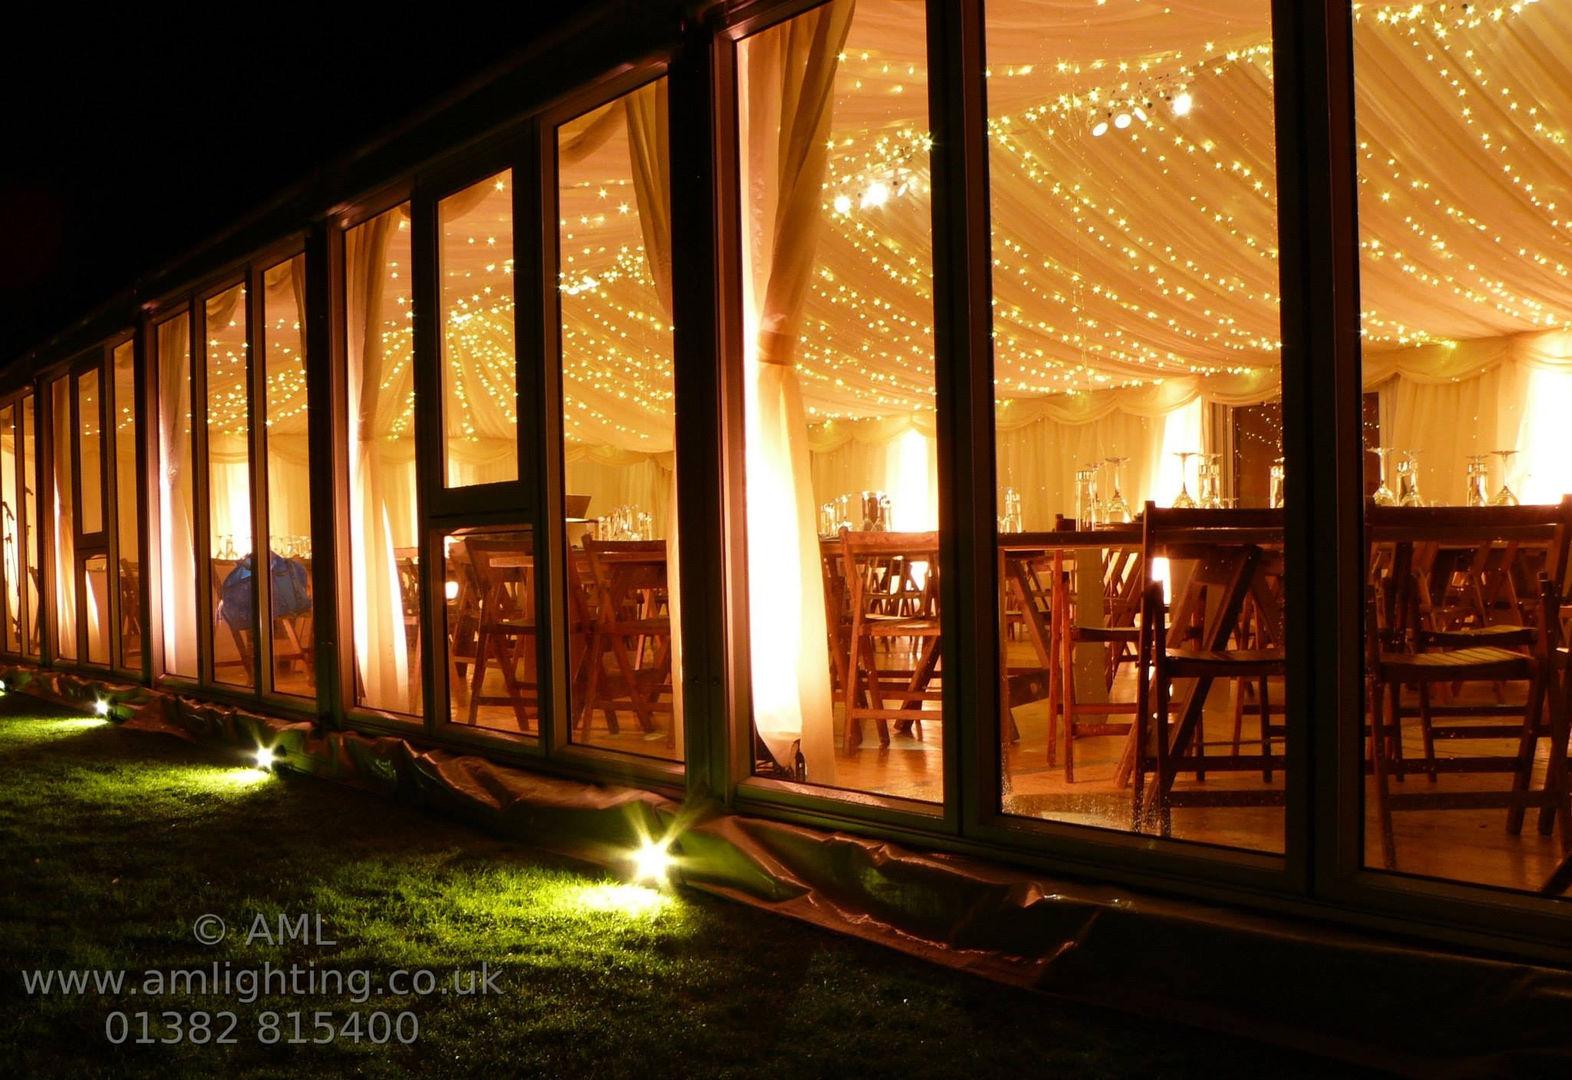 Marquee Fairy Lights and Exterior Lighti